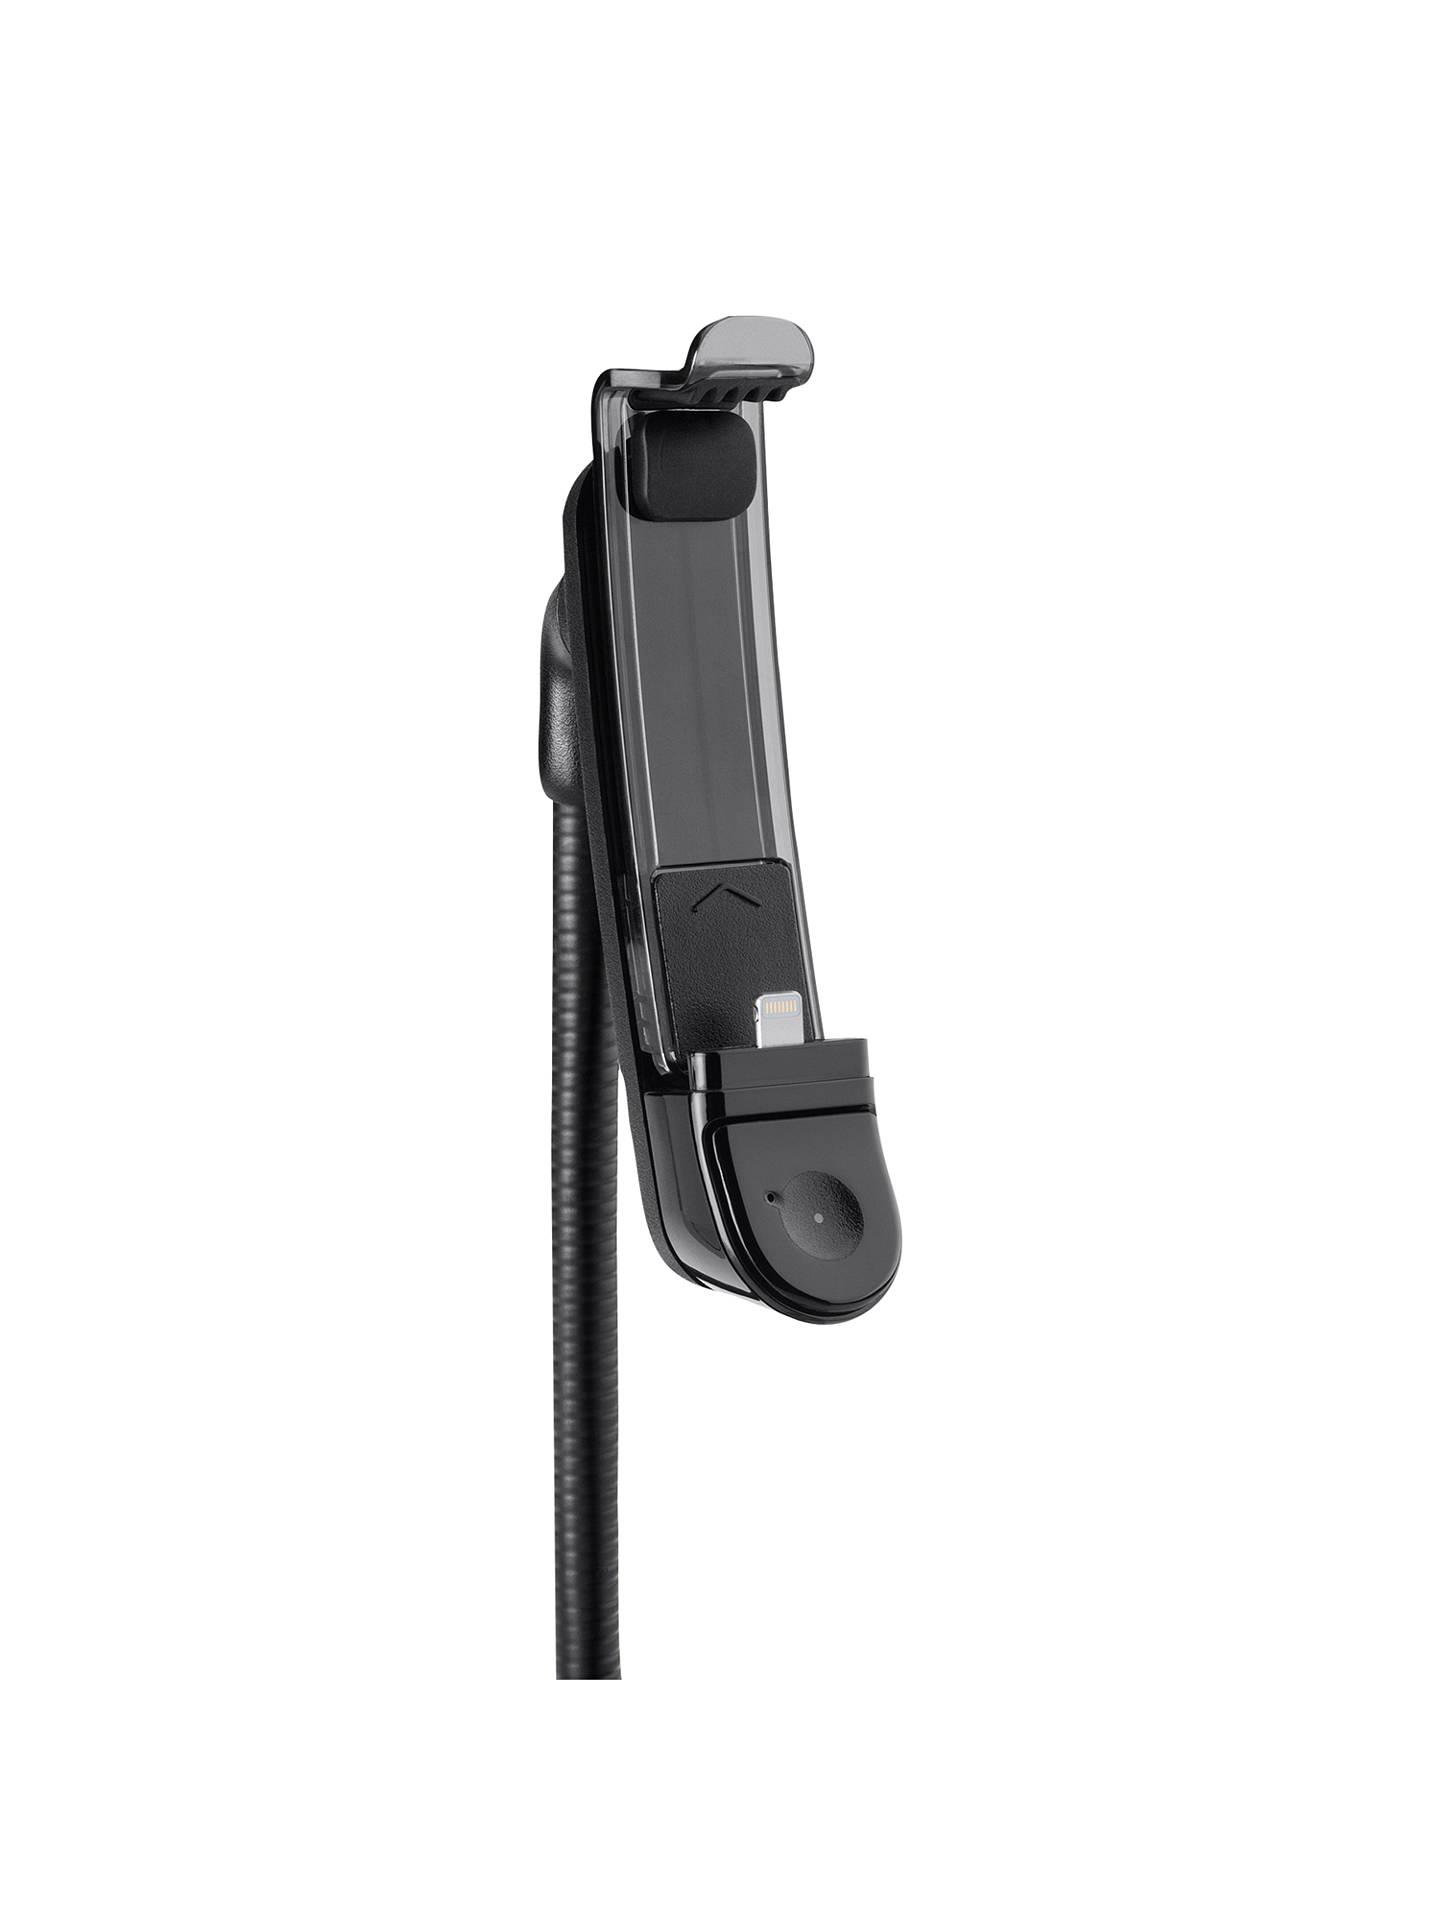 Belkin Tunebase With Hands Free Fm Transmitter Lightning For Mobile Phones Buybelkin Connector Iphone 5 5c